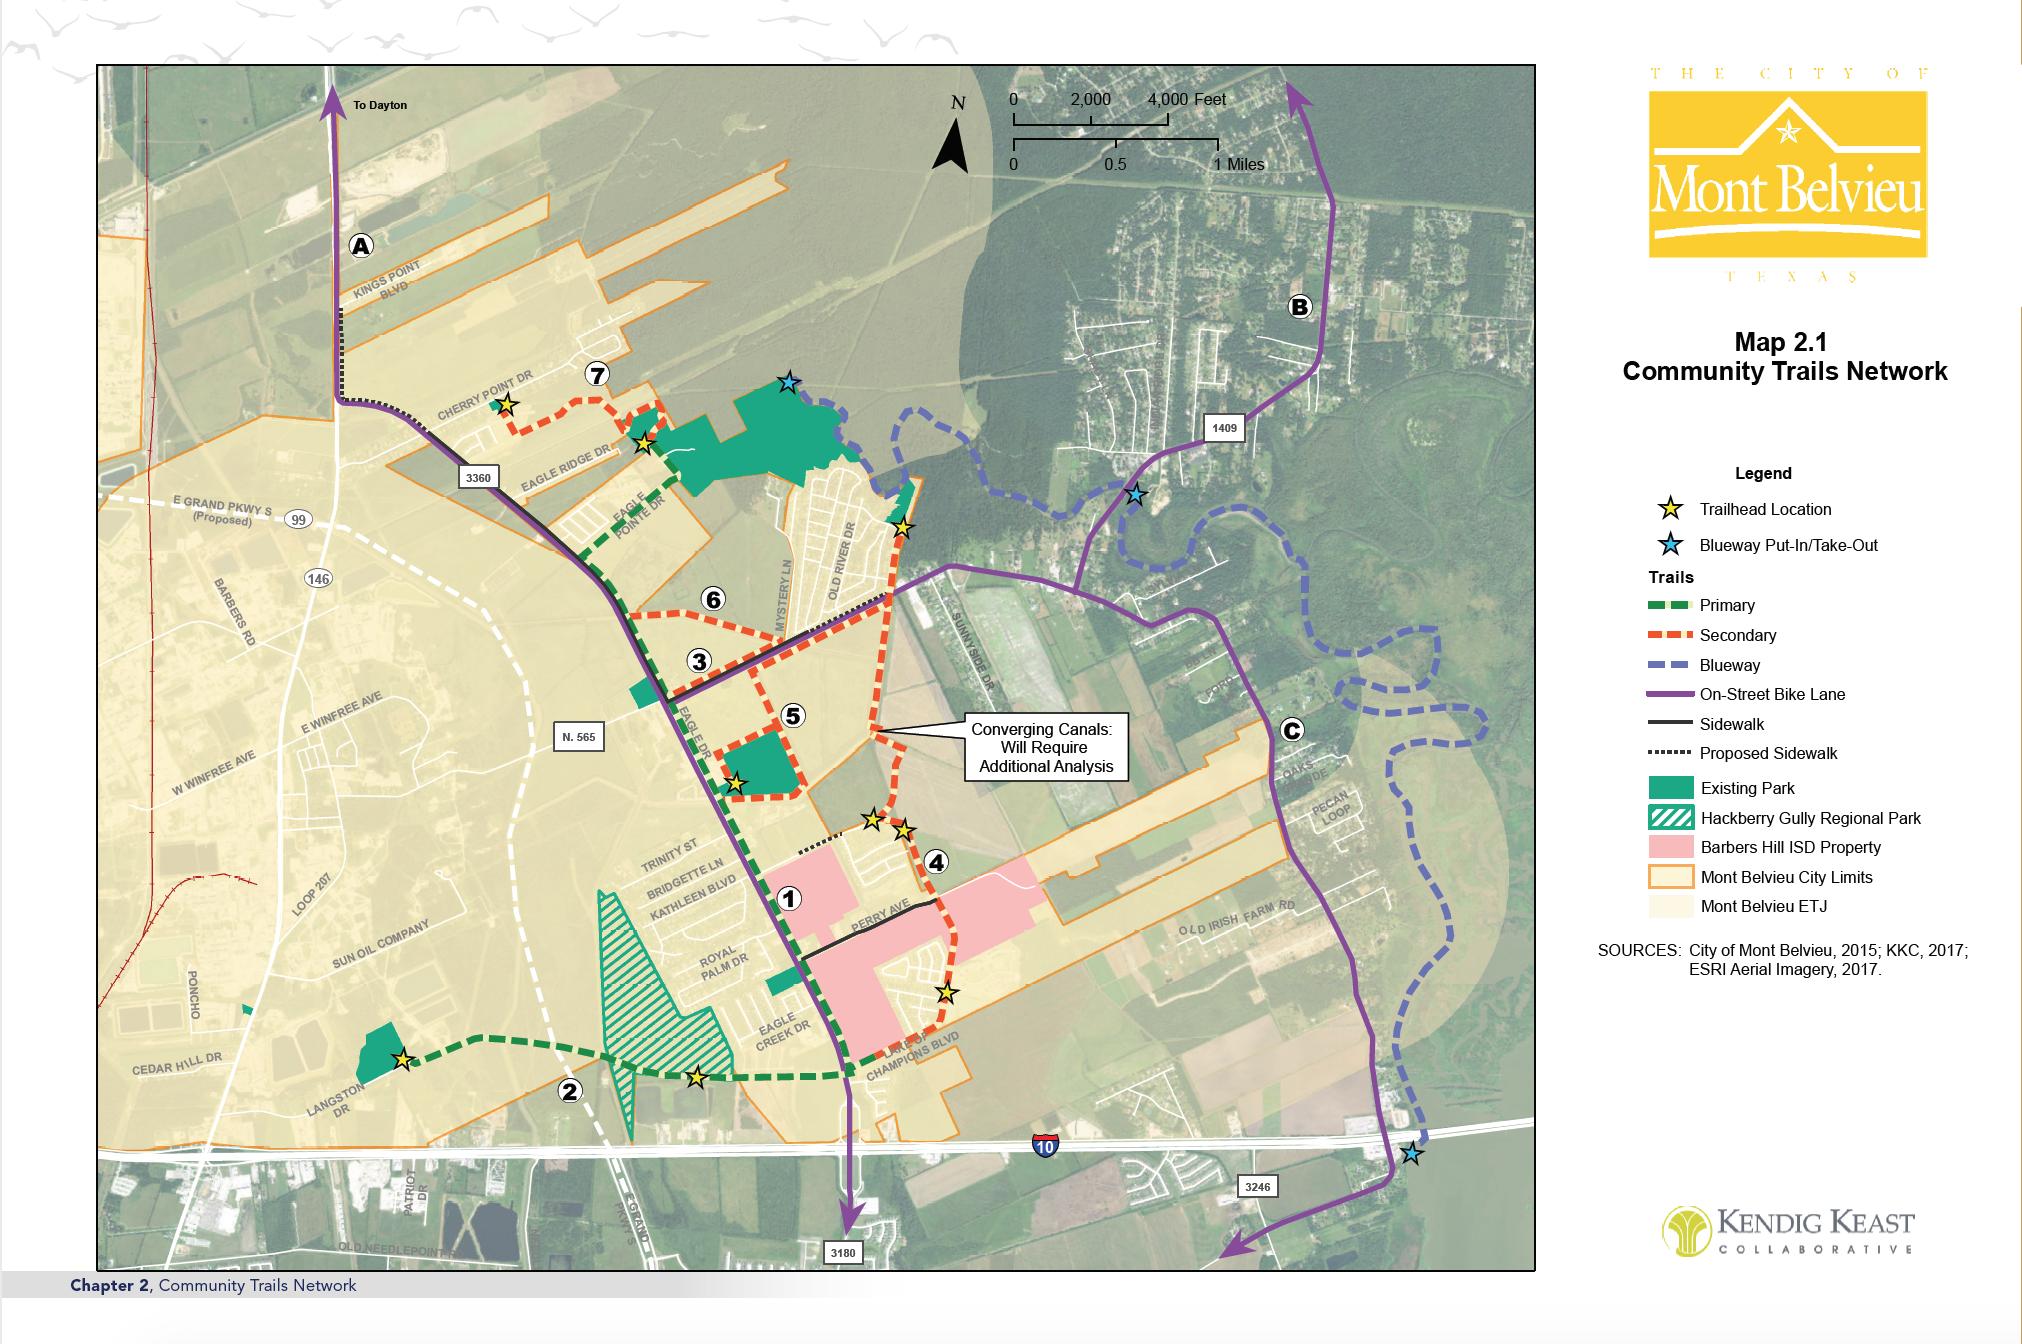 RGME to Design New Sidewalks for City of Mont Belvieu